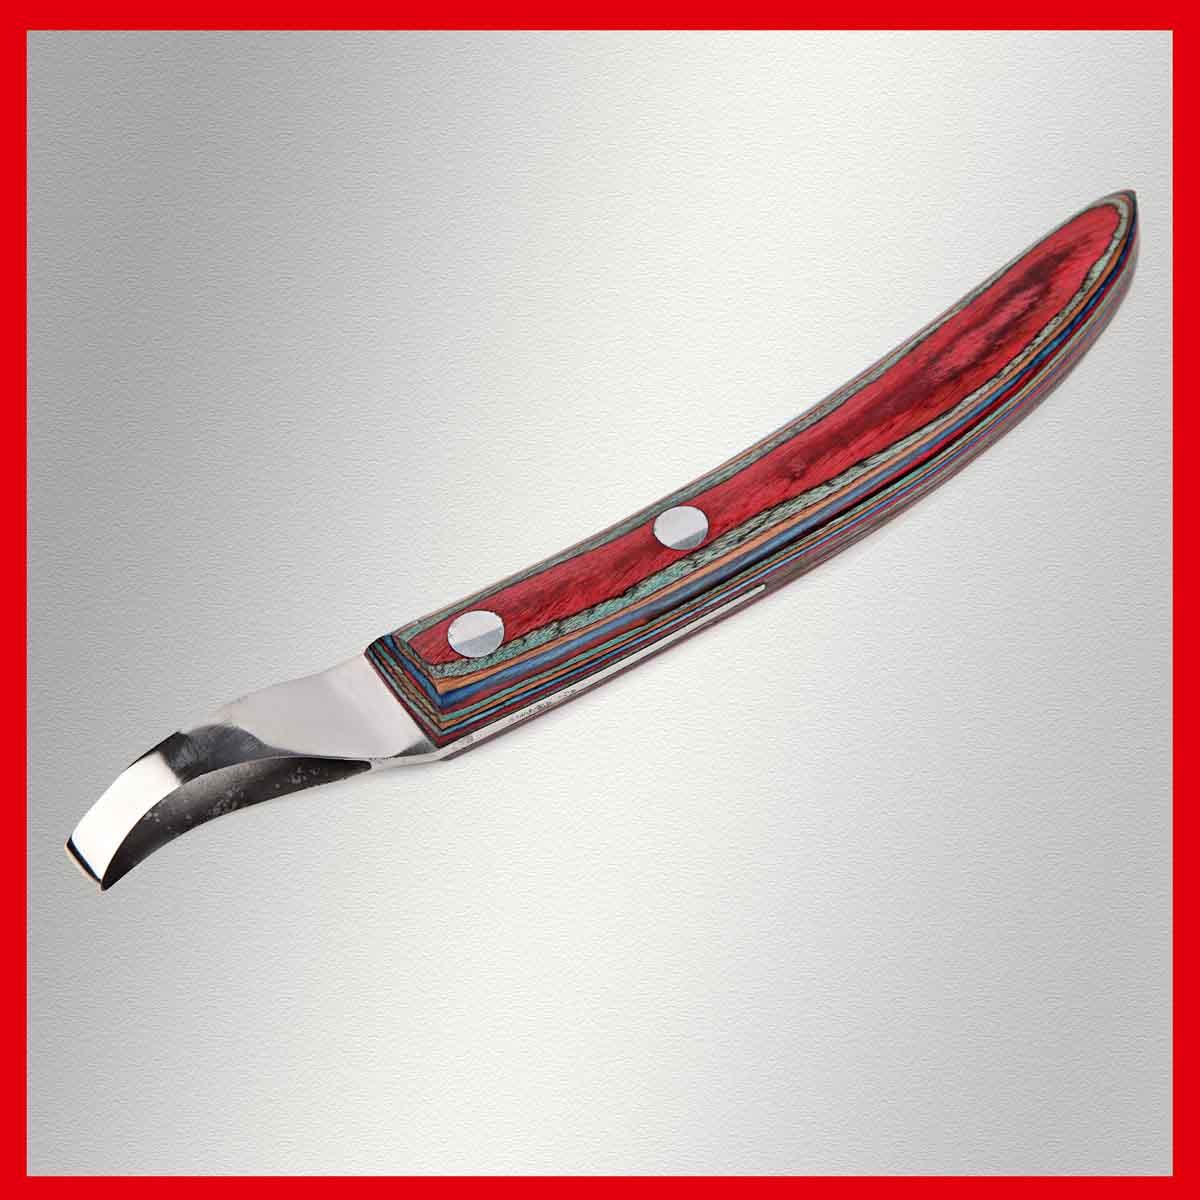 Jim Blurton Loop Knives